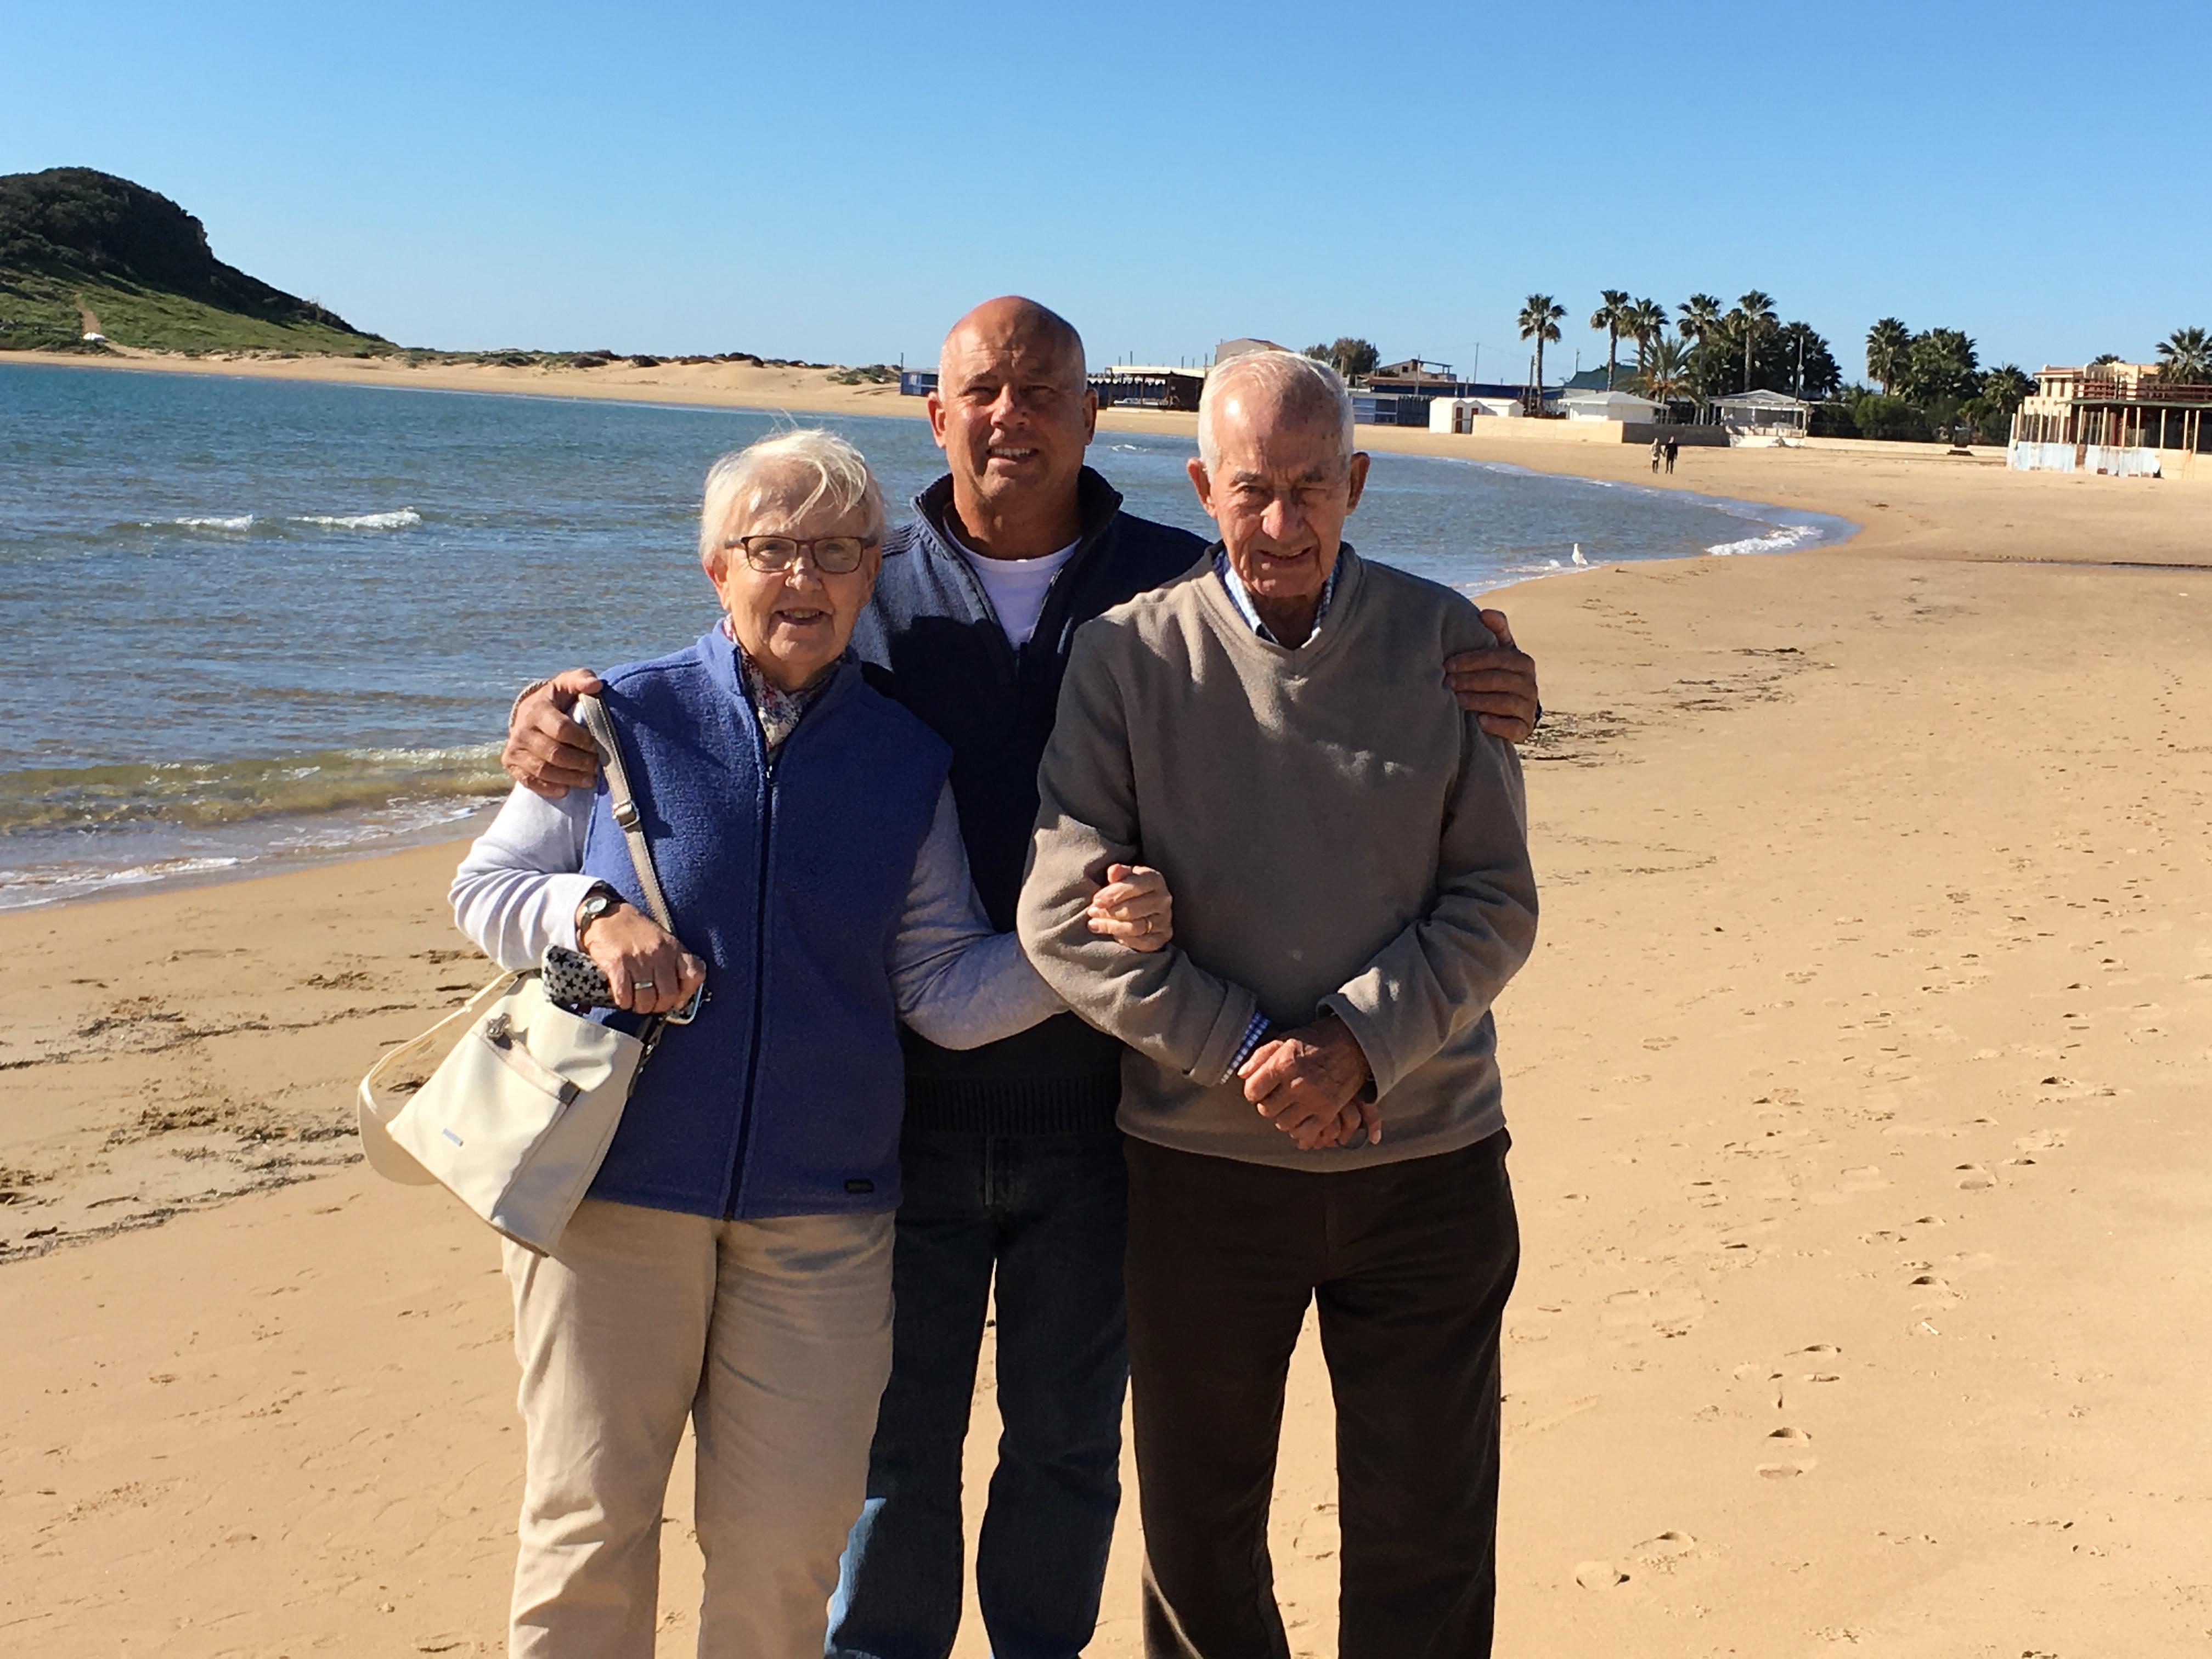 Beach walk with Betty and John